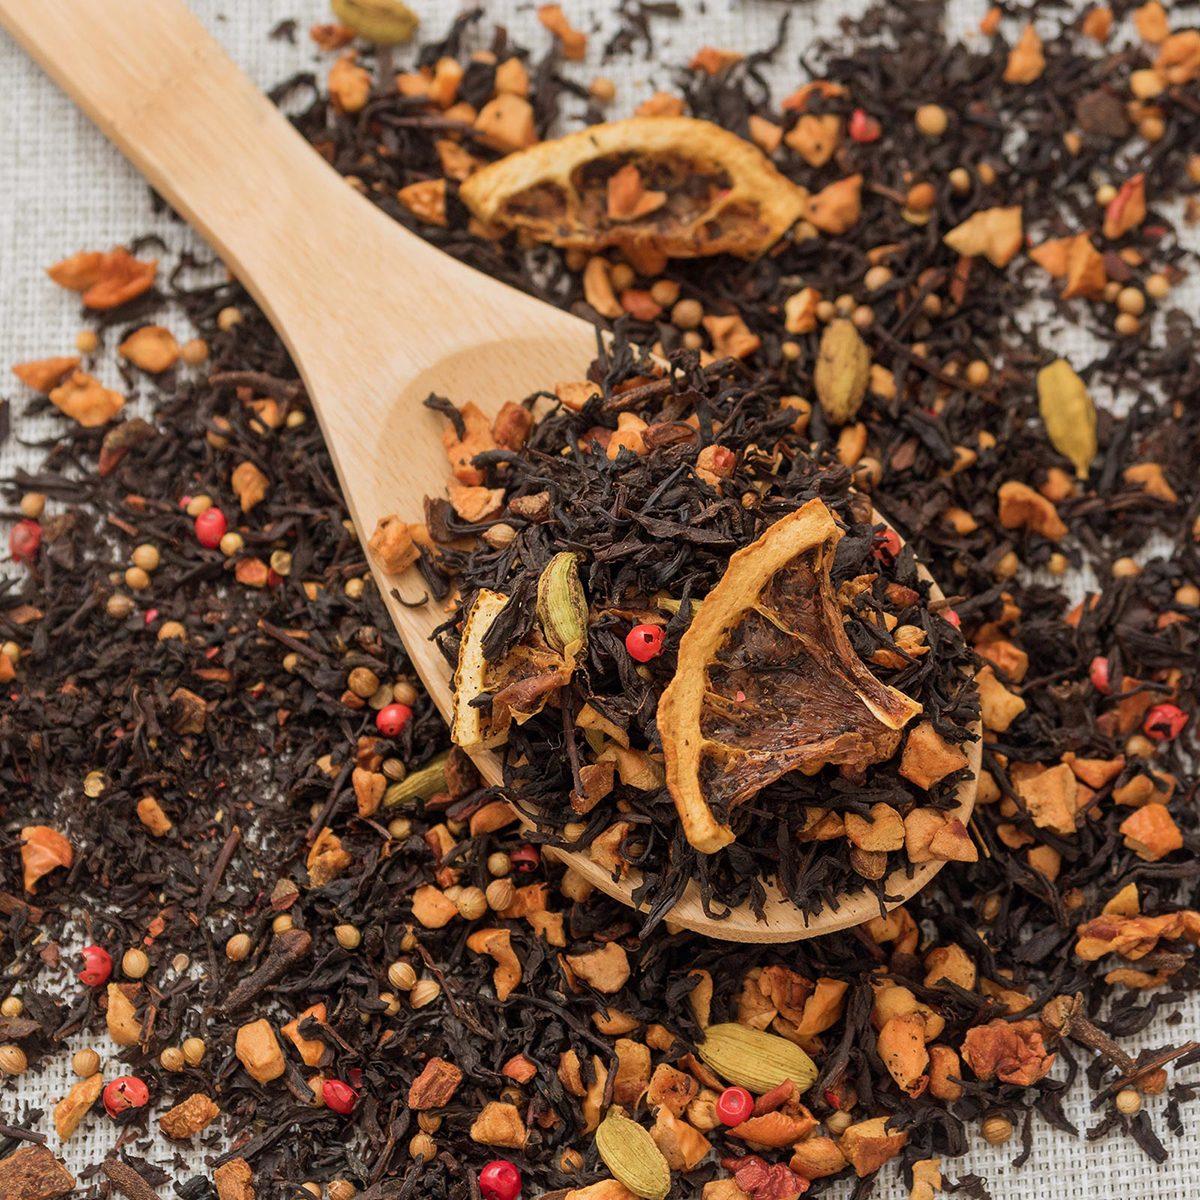 Loose leaf tea with dried oranges